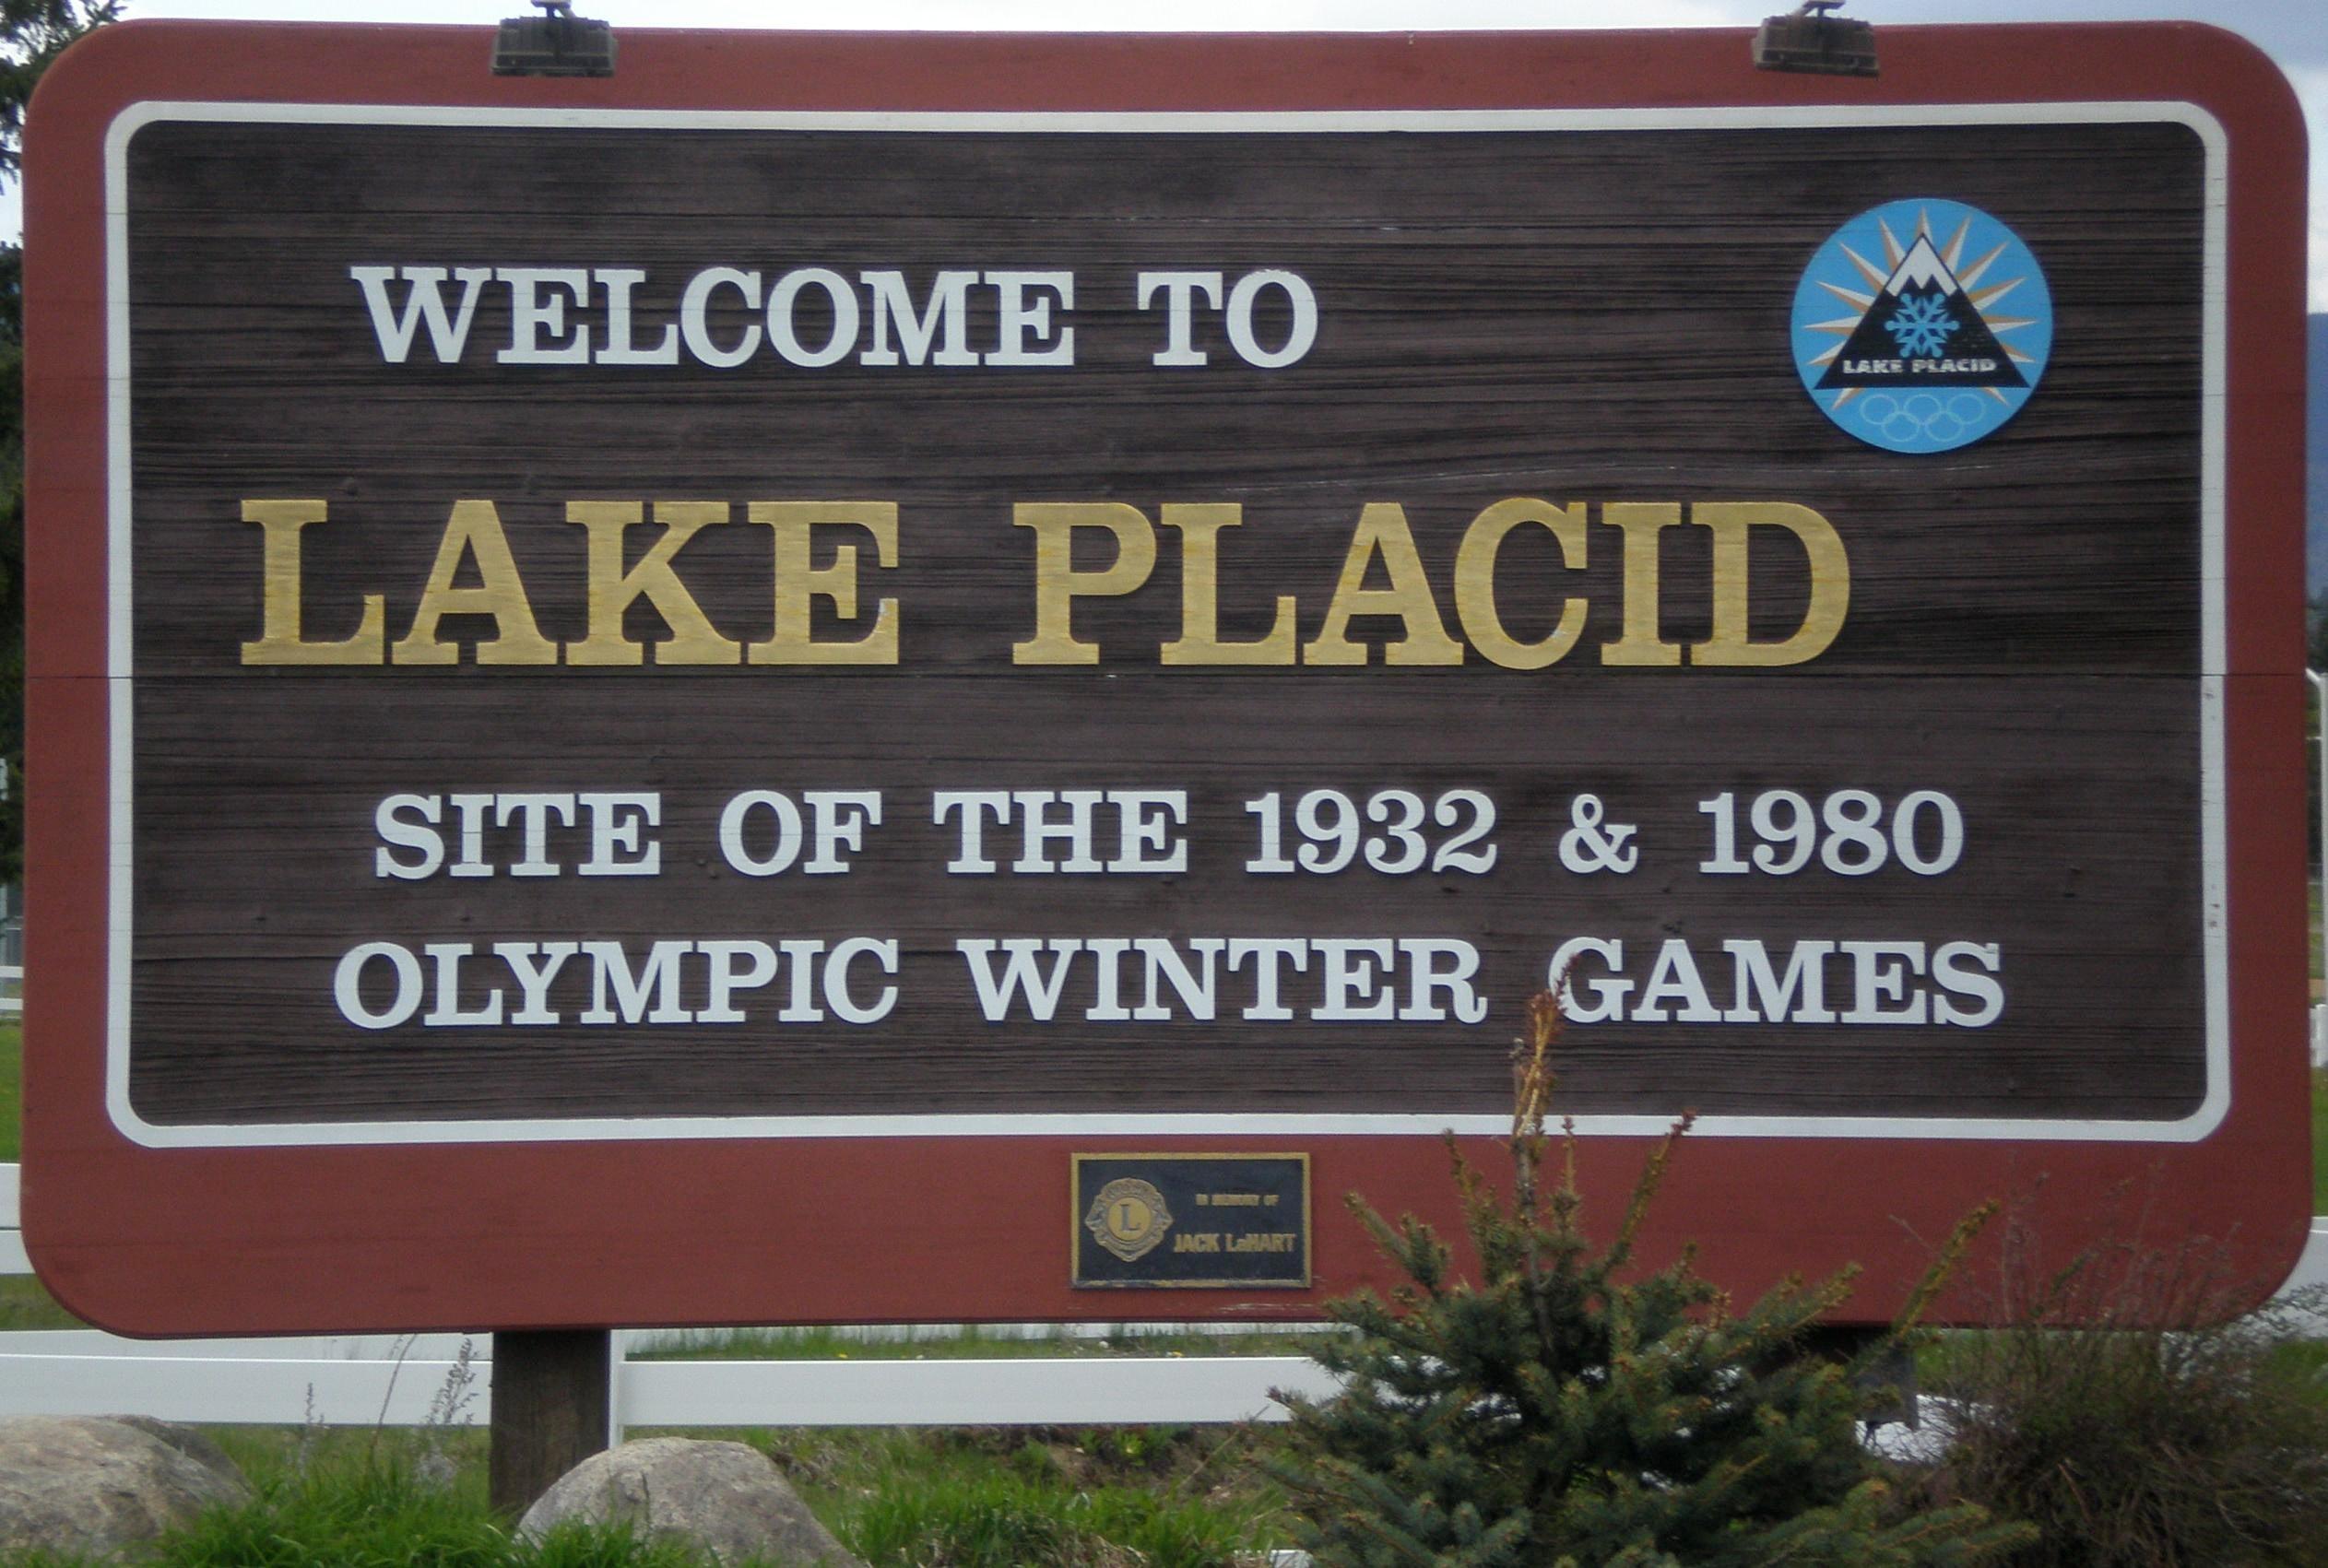 lake placid image.jpg